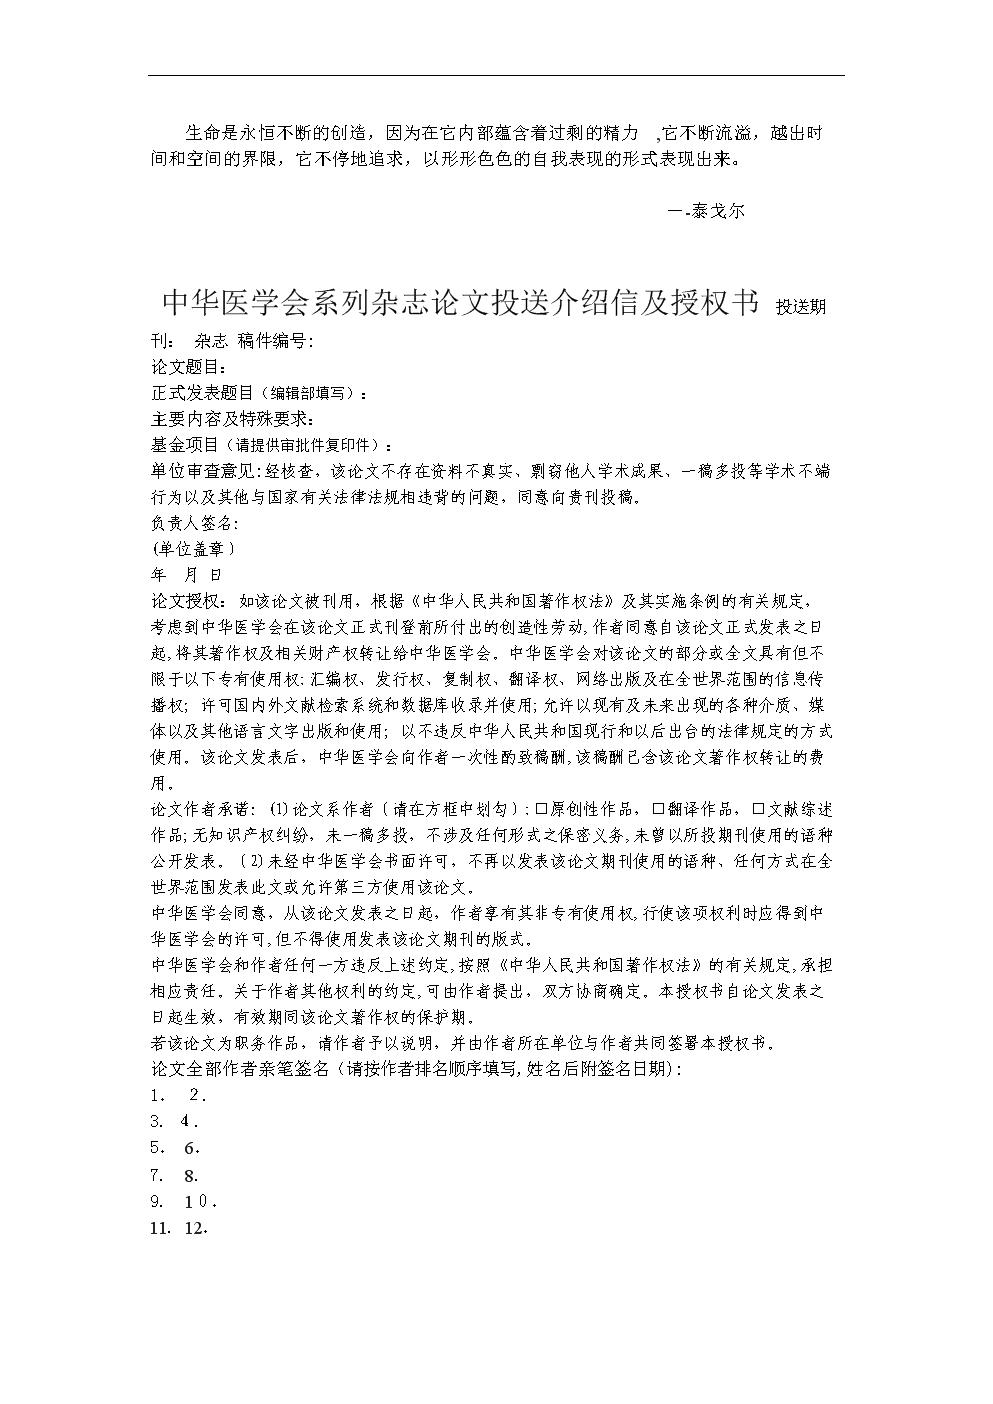 aekffyt中华医学会系列杂志论文投送介绍信及授权书 投送期刊.doc